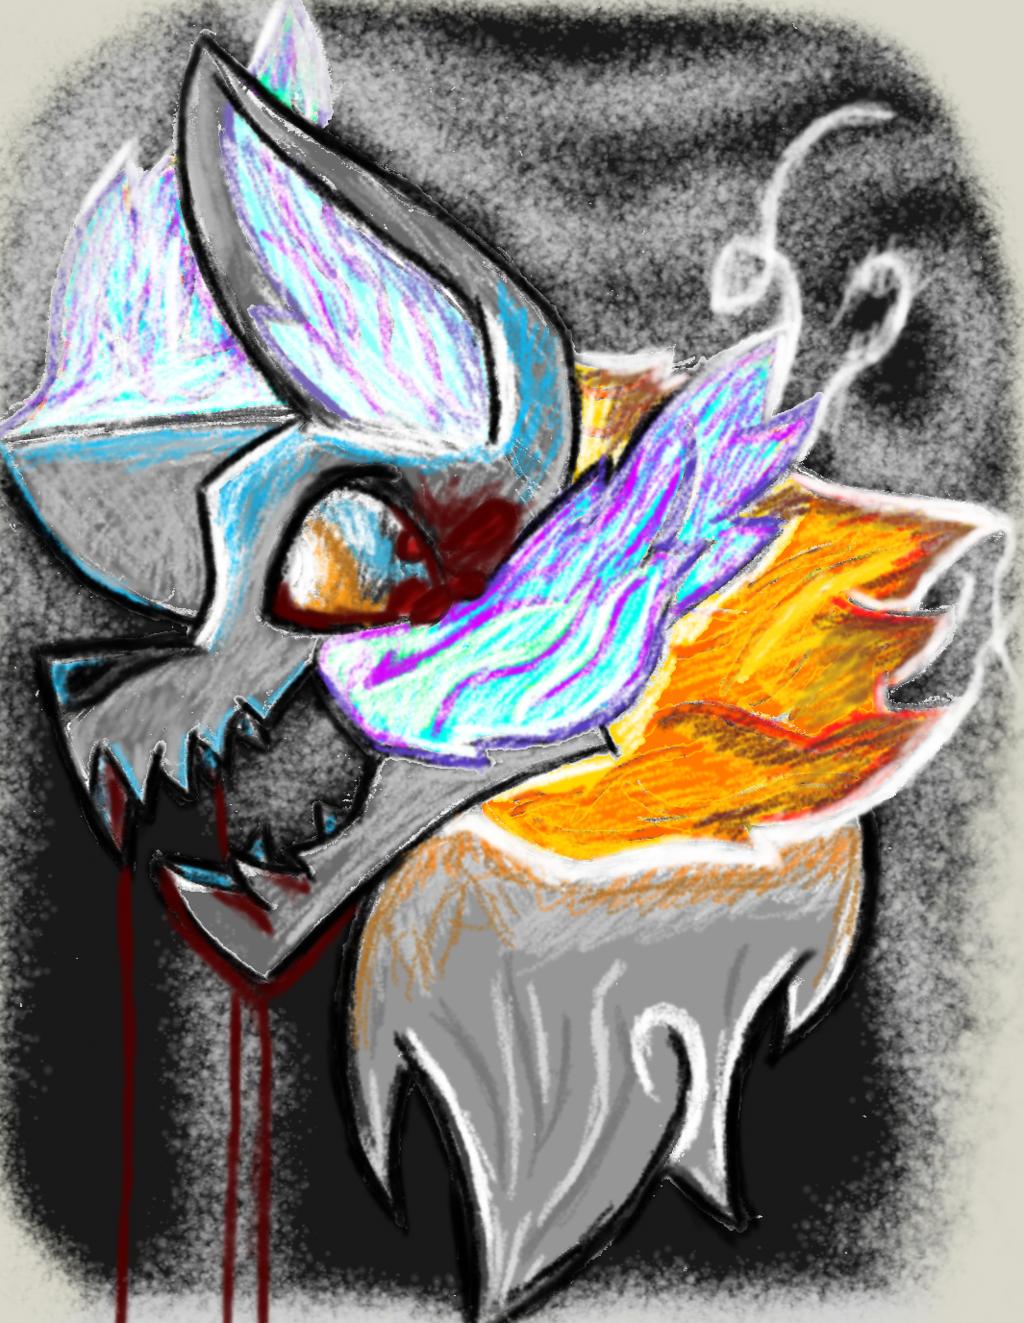 Most recent image: Skull K9 WIP